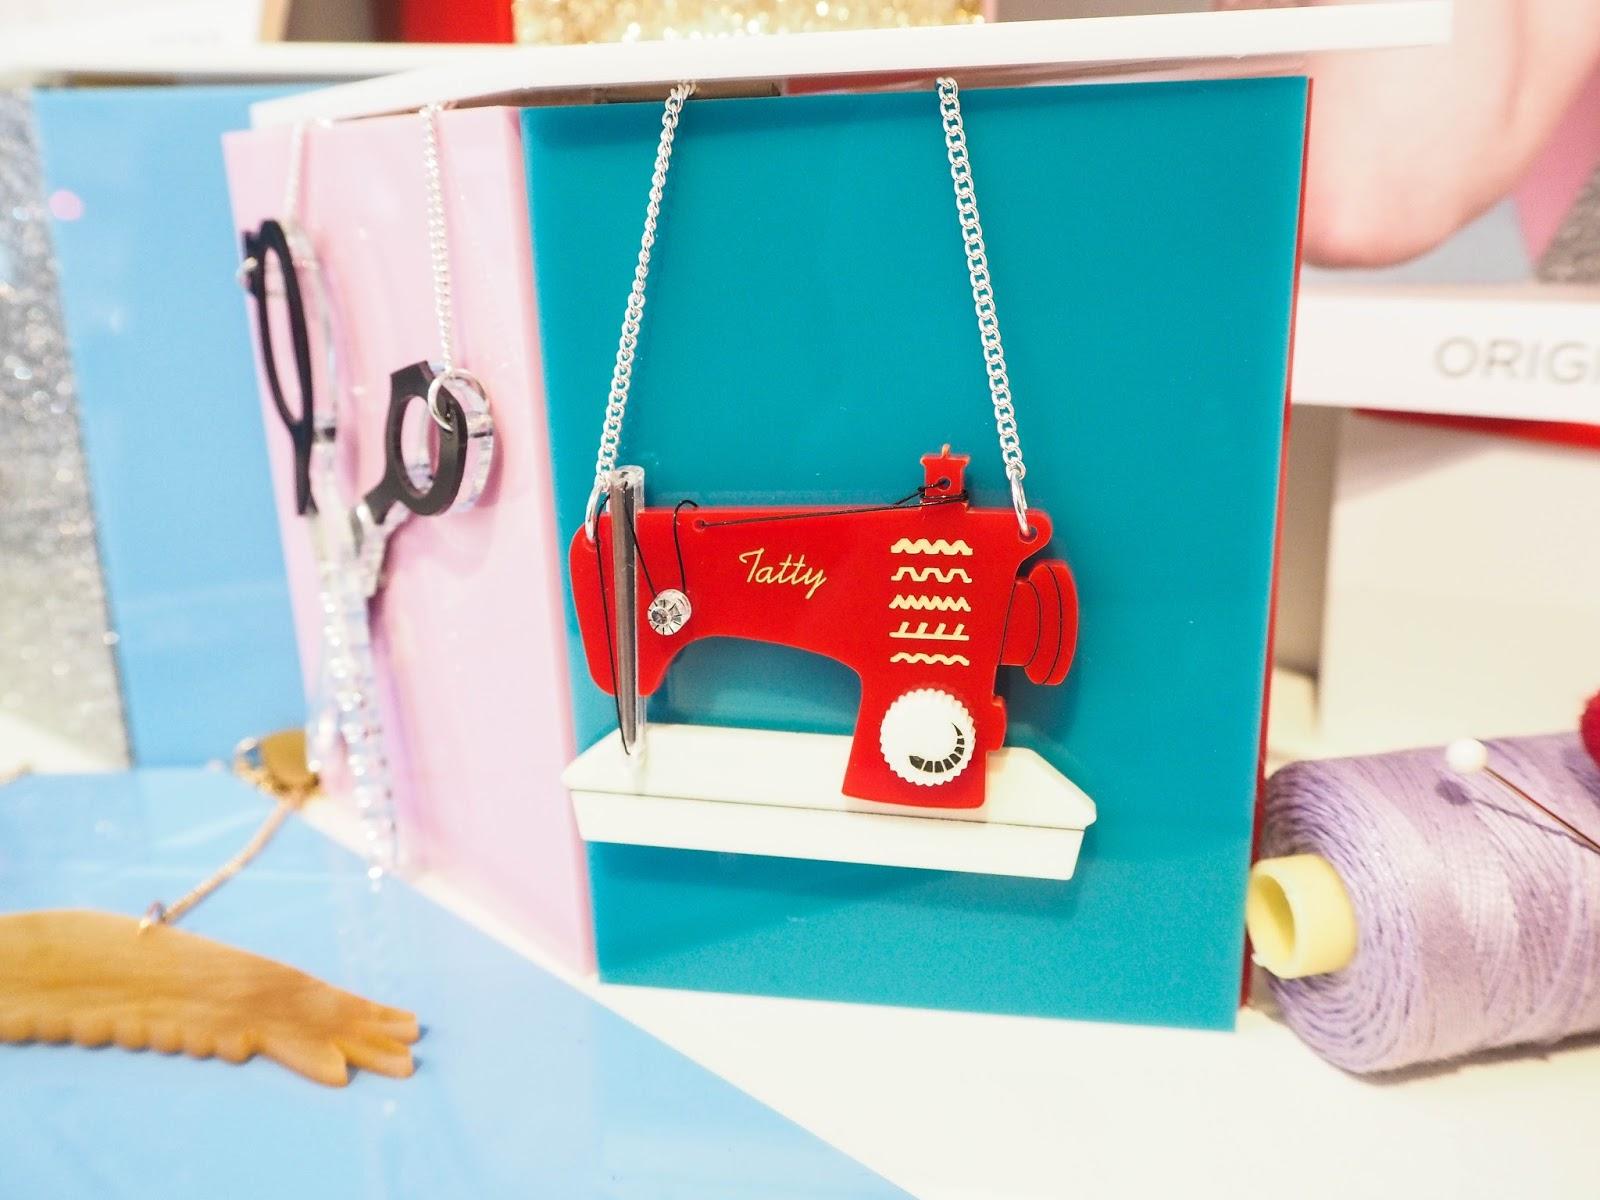 Tatty Devine sewing machine necklace AW16